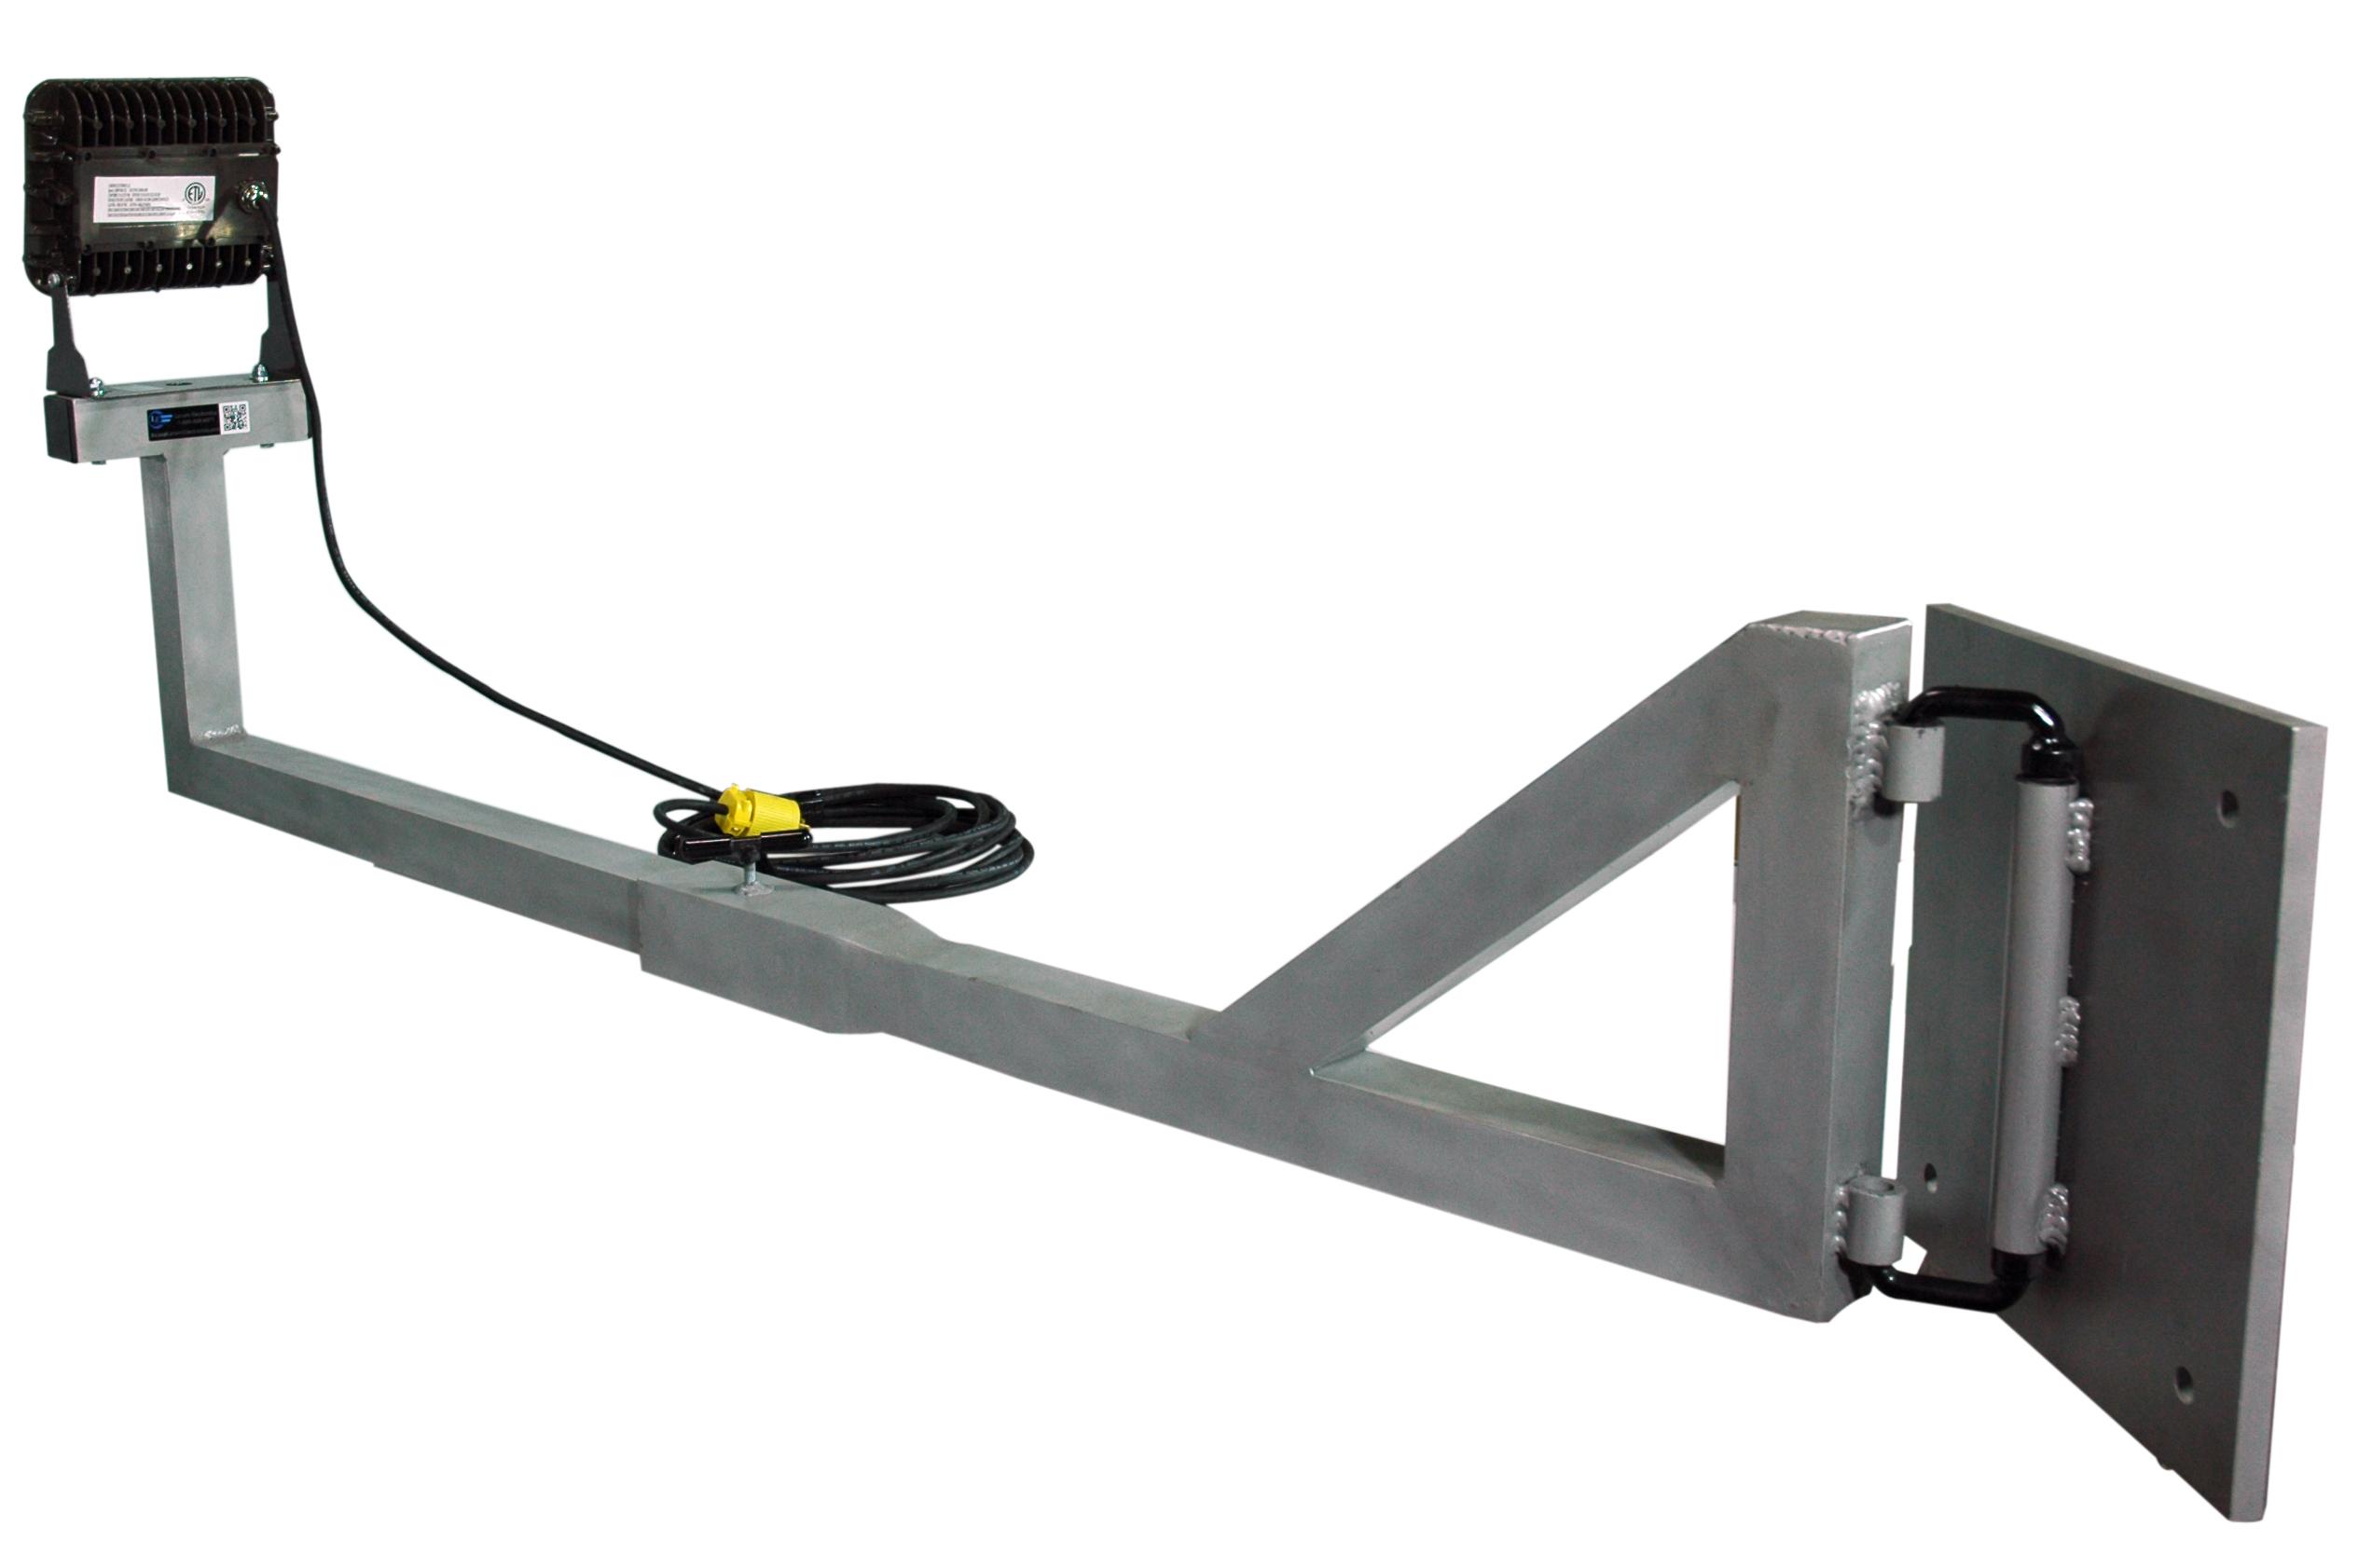 Larson Electronics Releases A 60 Watt Led Work Area Dock